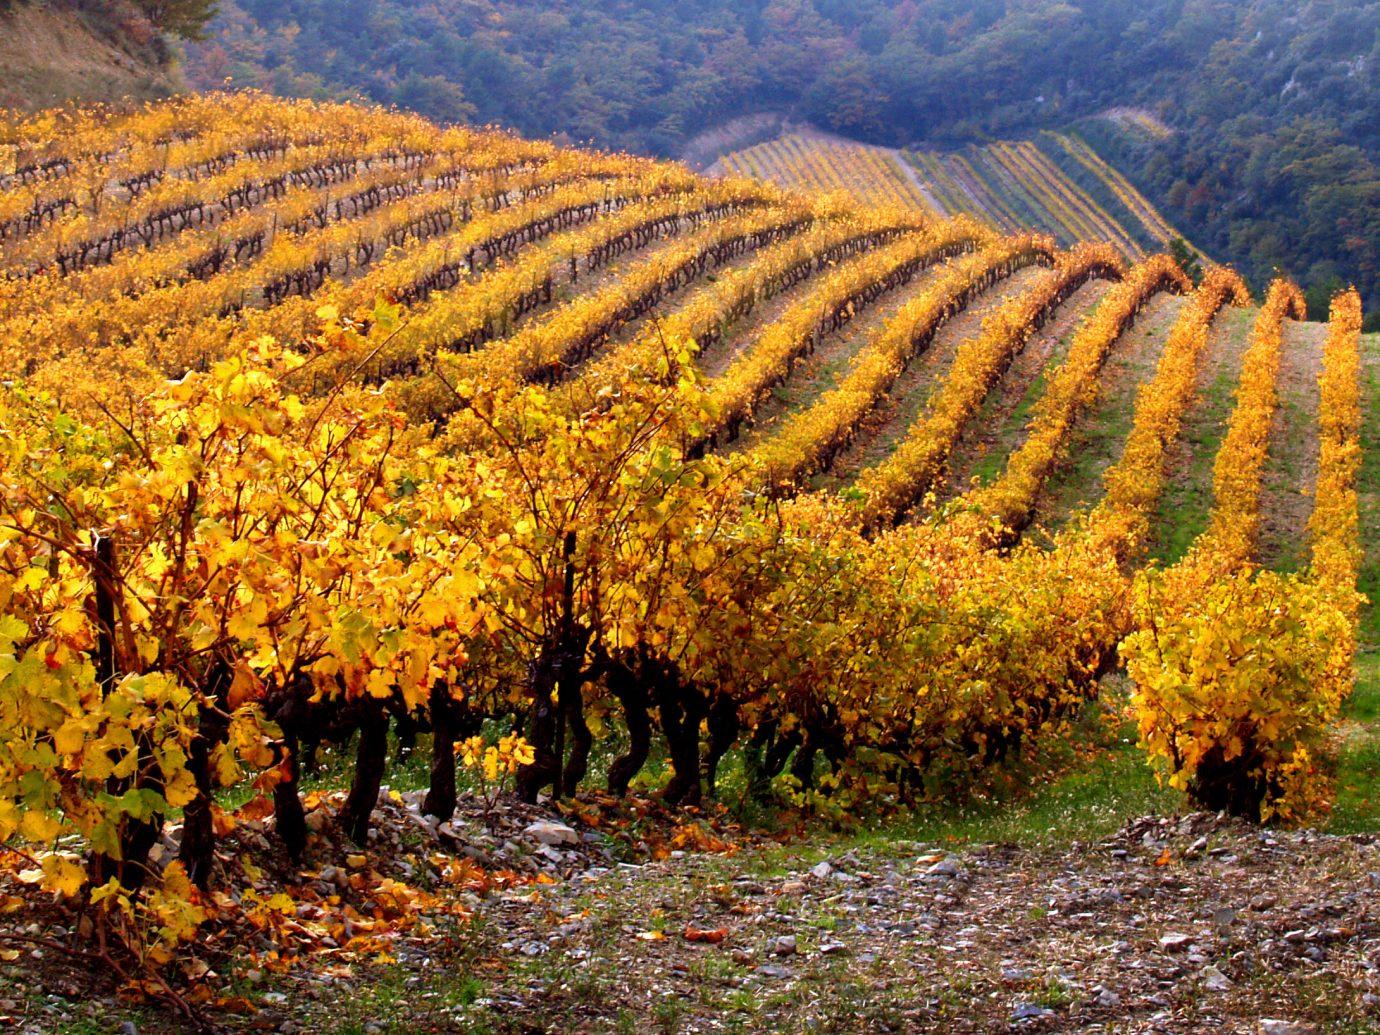 Vineyard Landscape in autumn, Provence, France